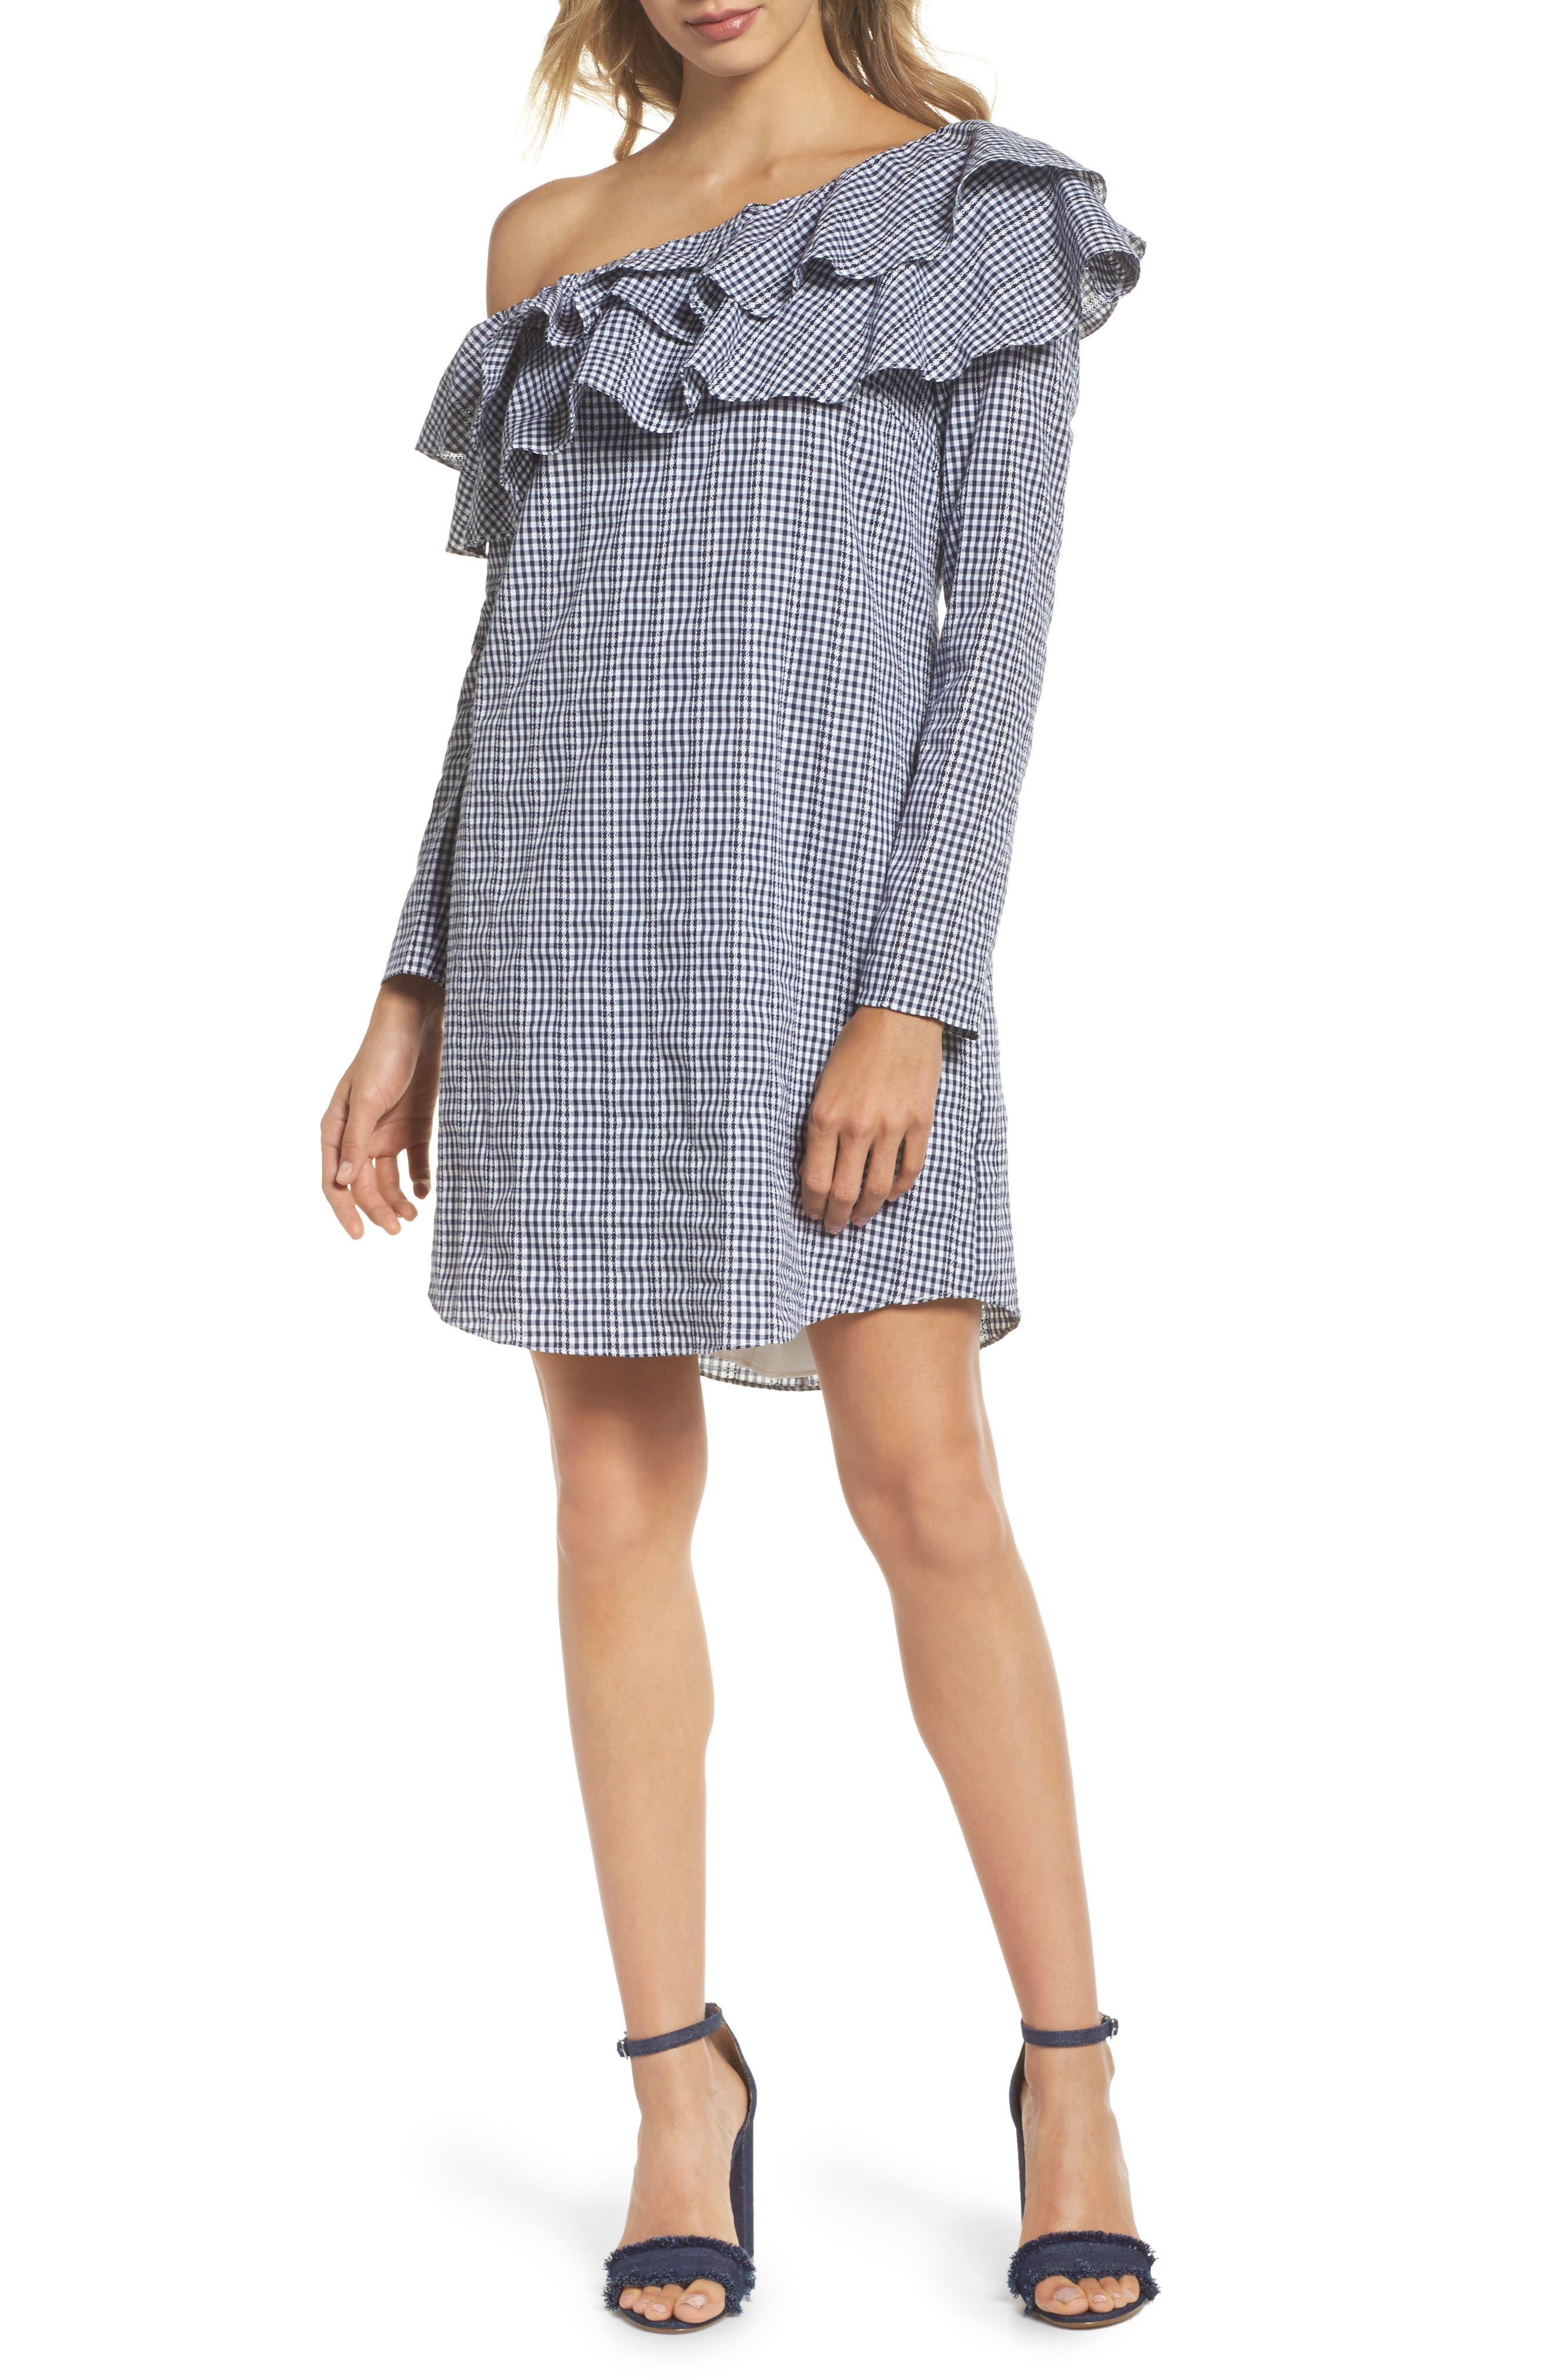 Adelyn Rae Gingham One-Shoulder Ruffle Dress